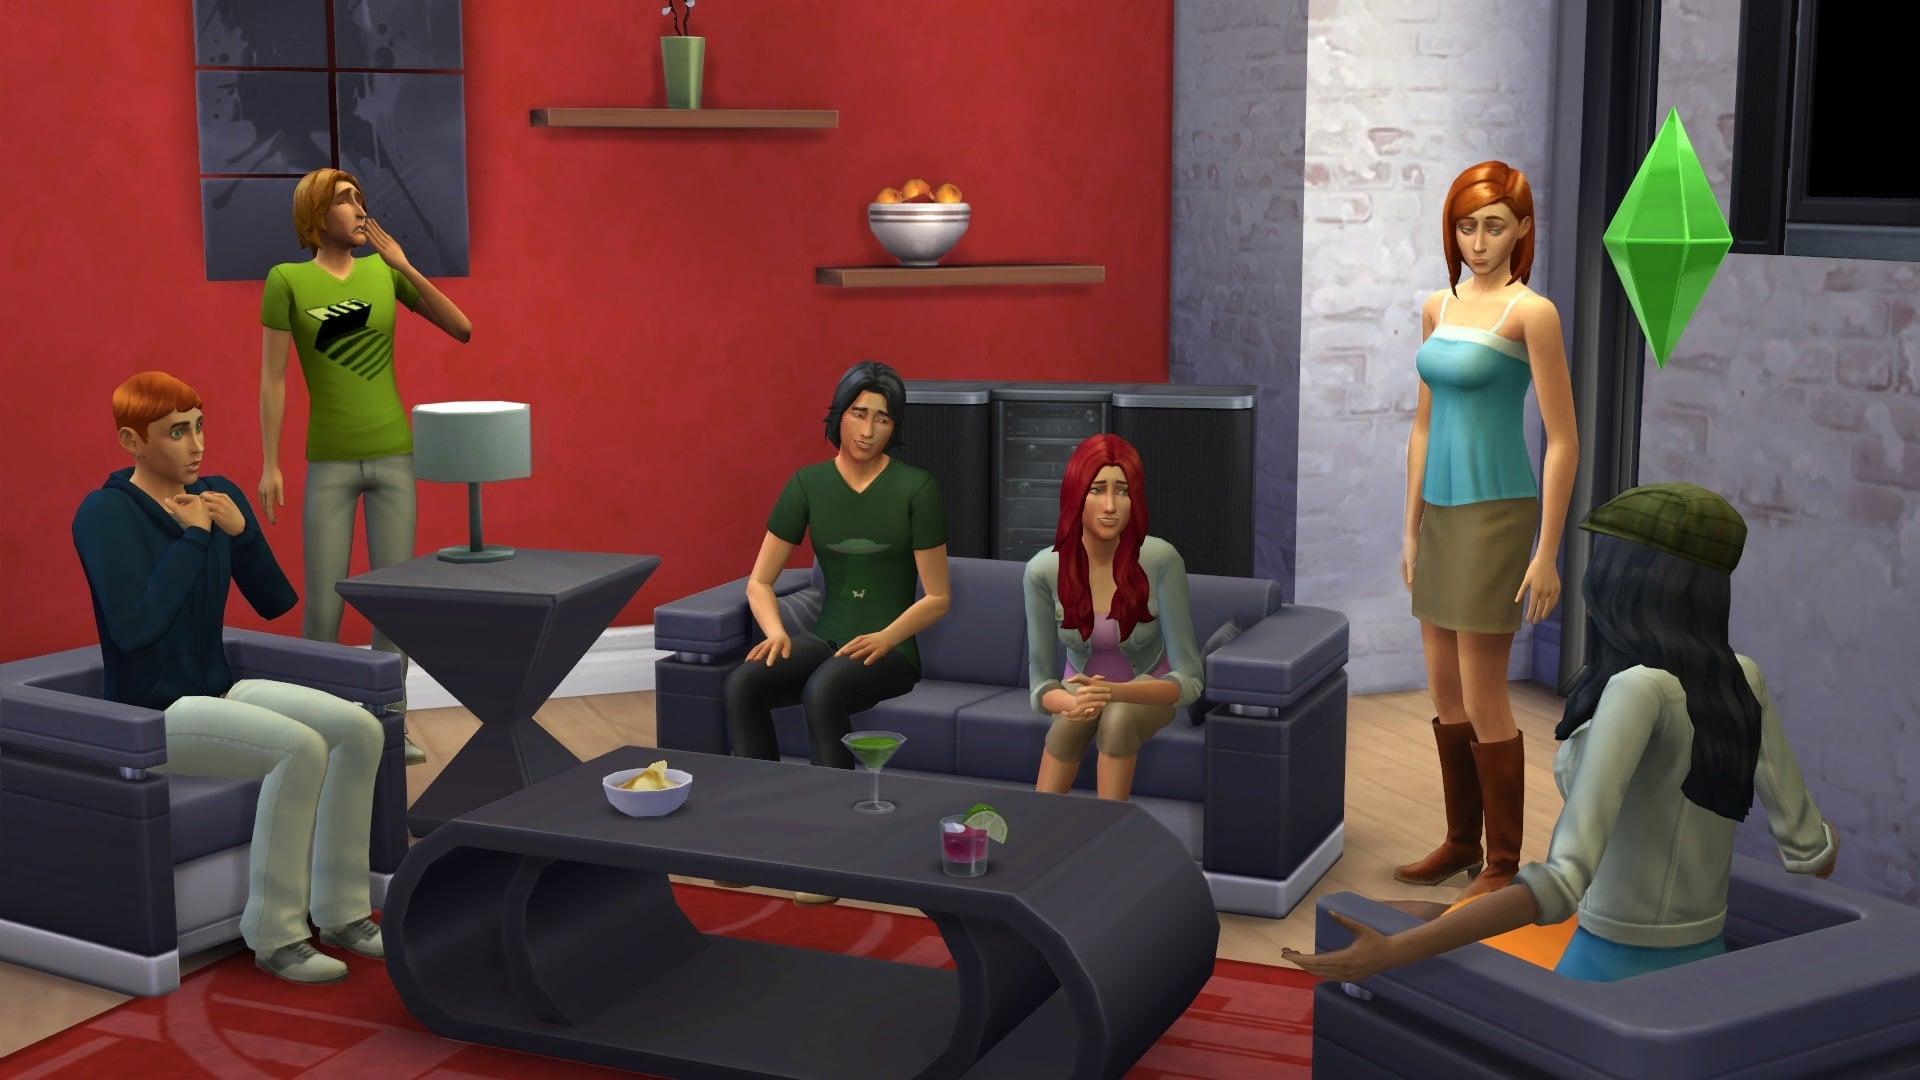 Heute im Team-Stream: Die Sims 4 (PC)